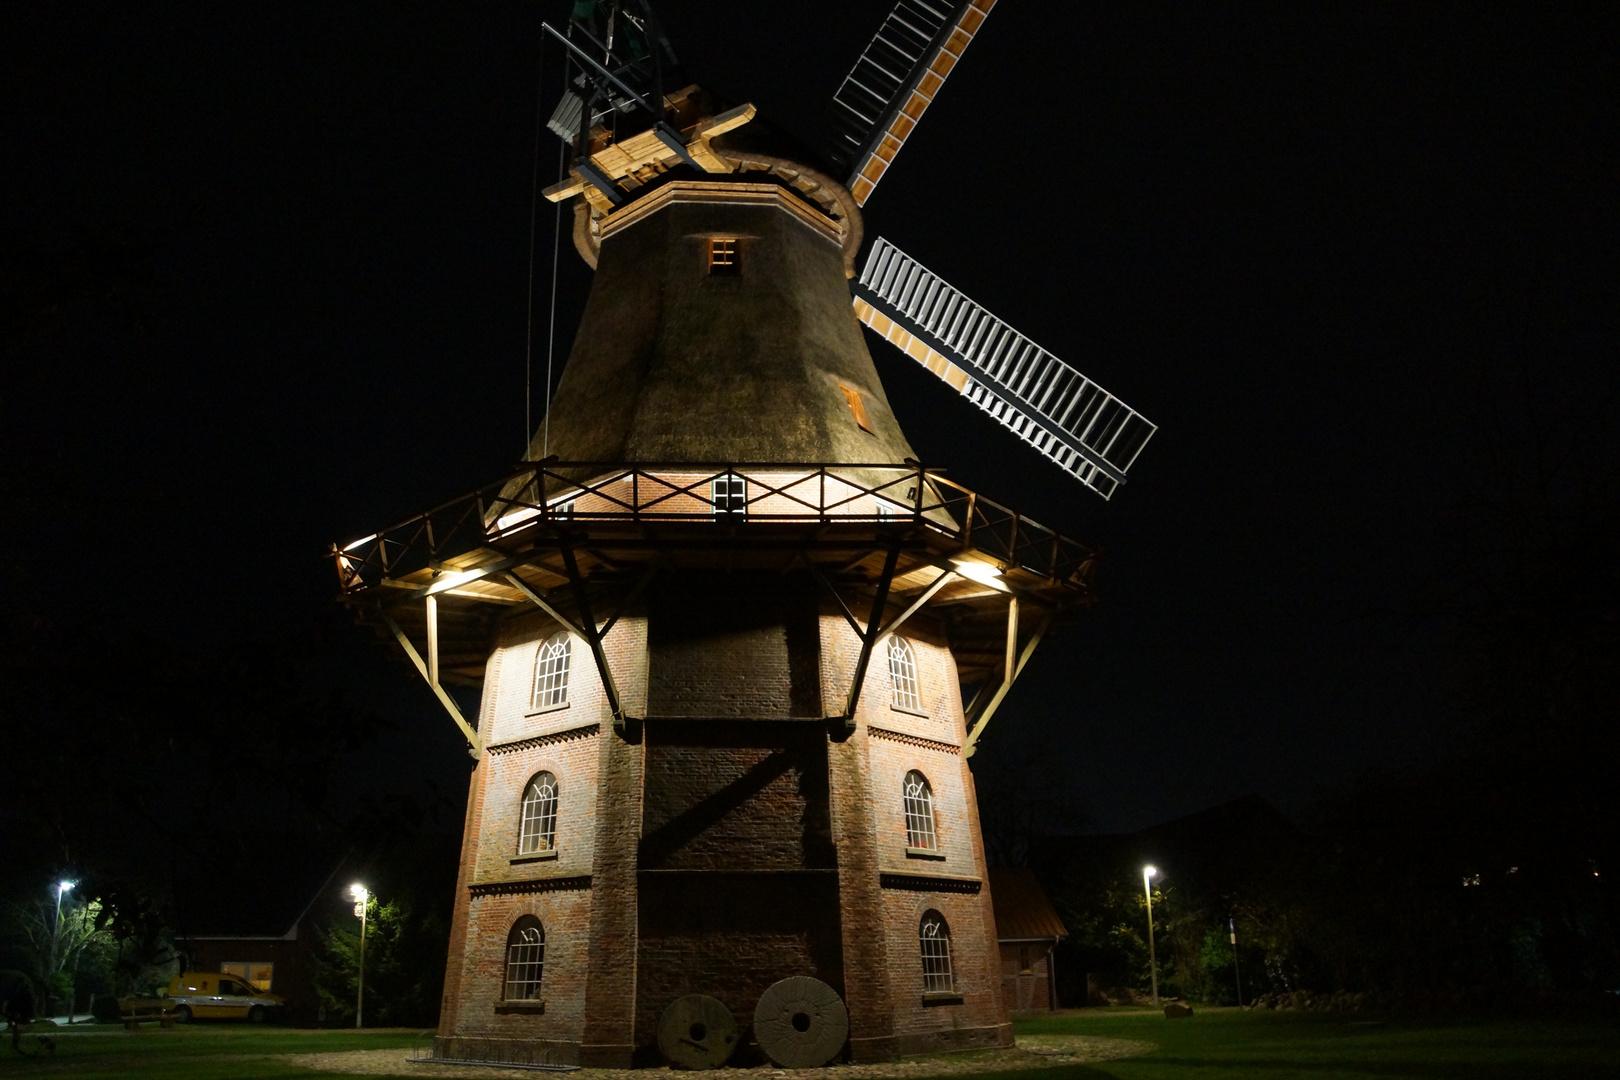 Schiffdorfer Mühle